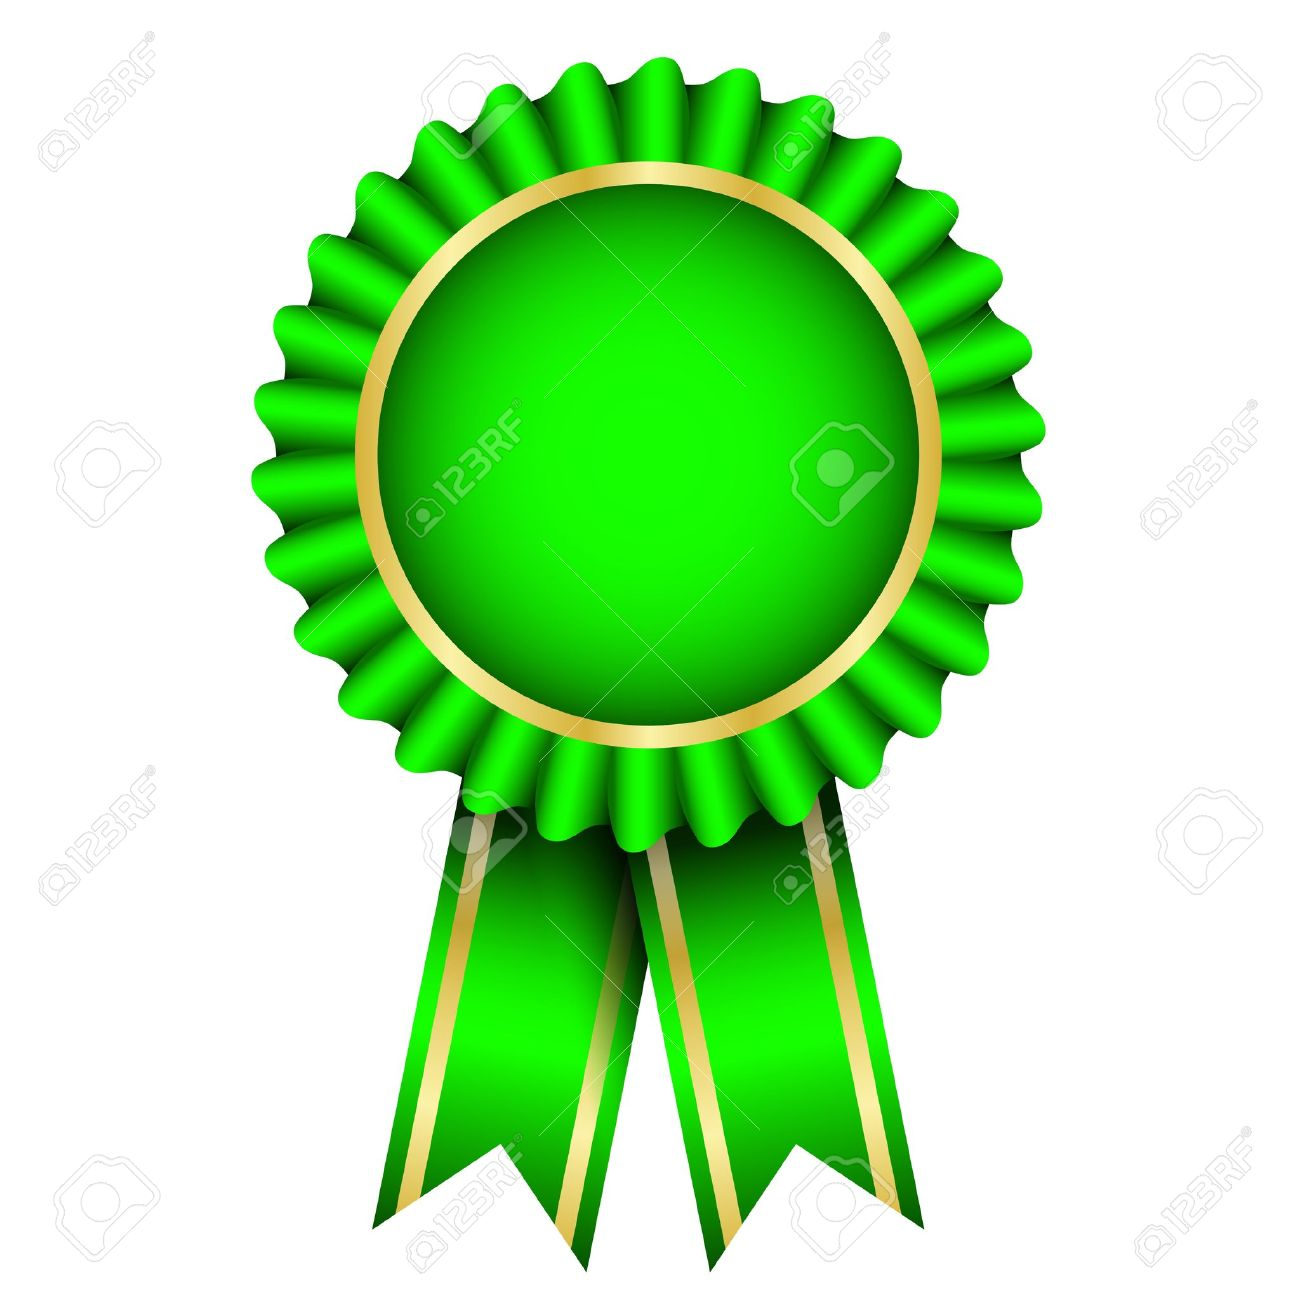 788 Award Ribbon free clipart.